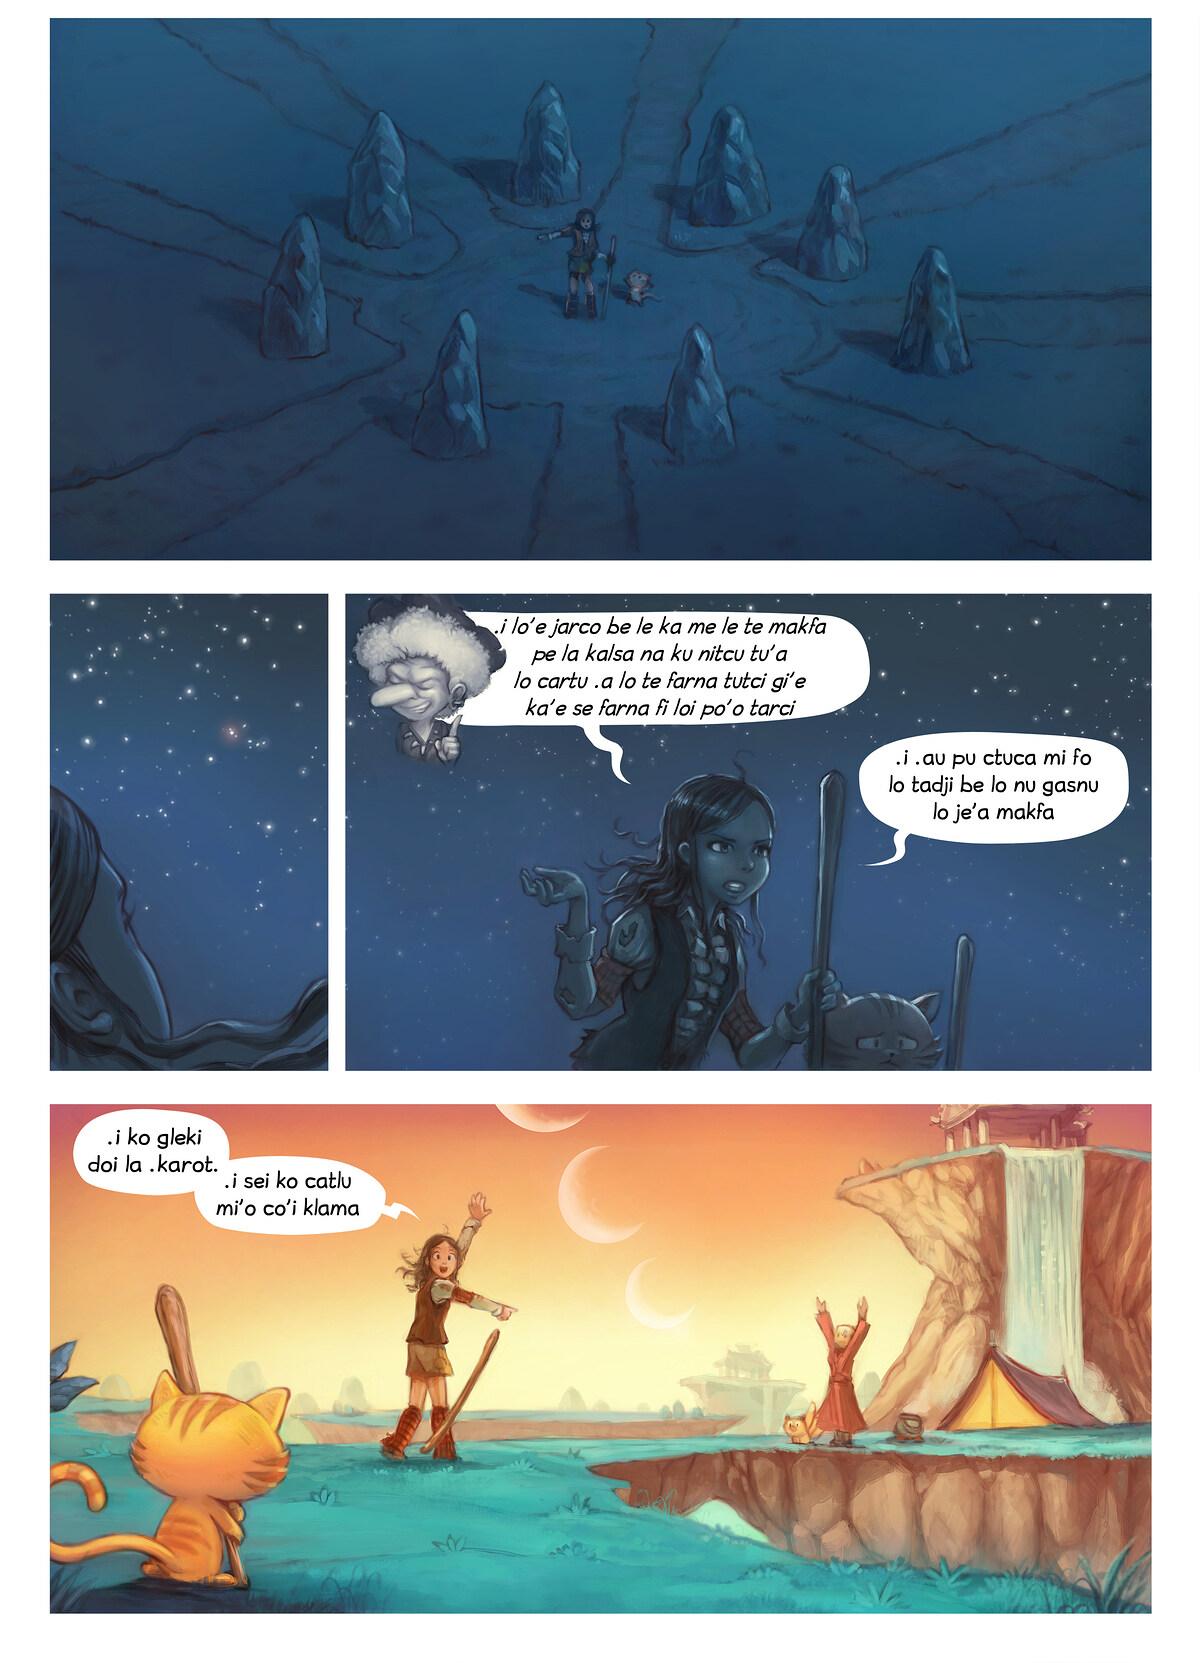 A webcomic page of Pepper&Carrot, pagbu 17 [jb], papri 6